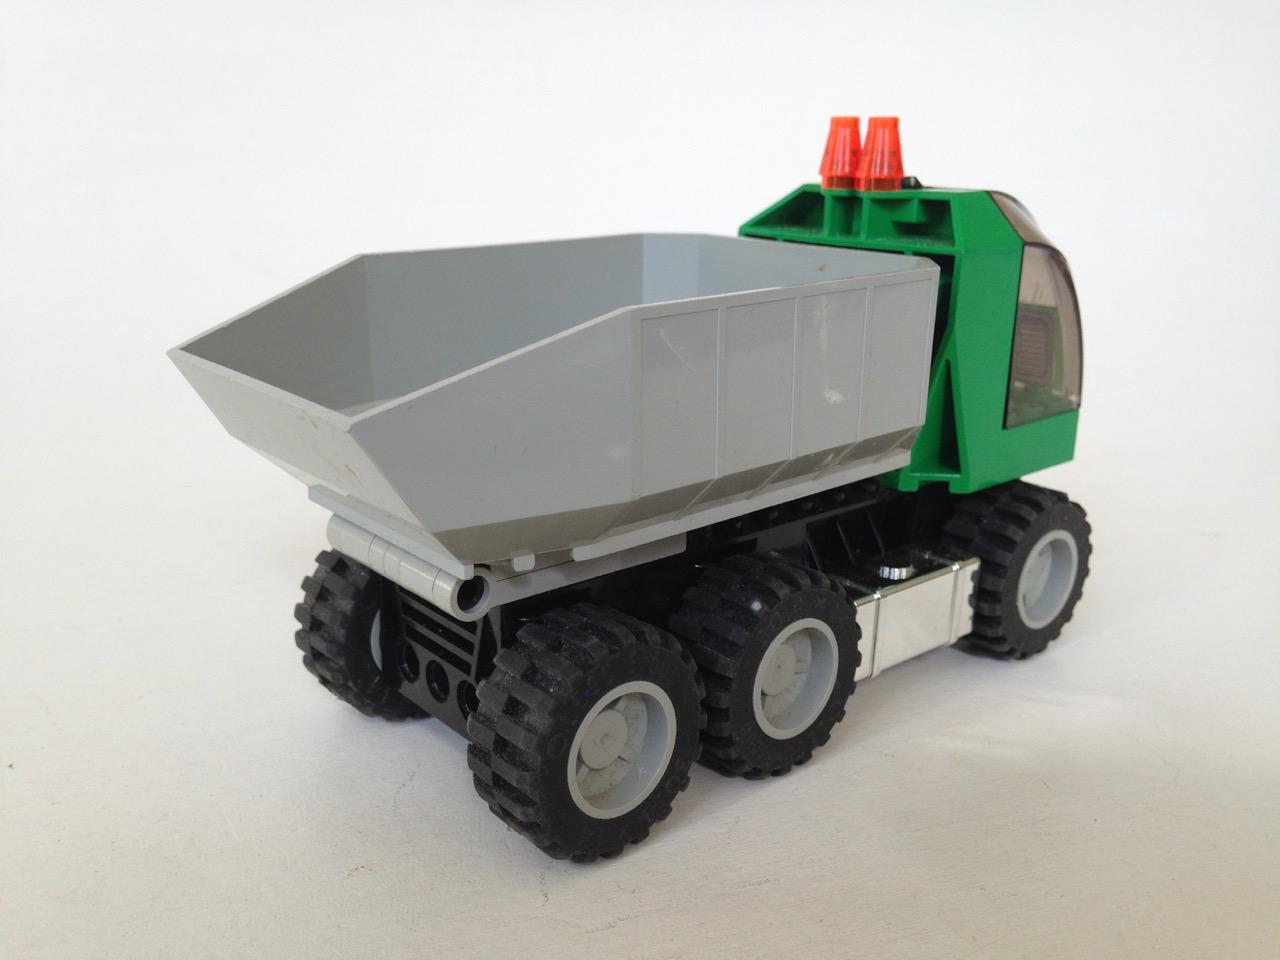 LE021 LEGO DUMP TRUCK WITH FIGURE